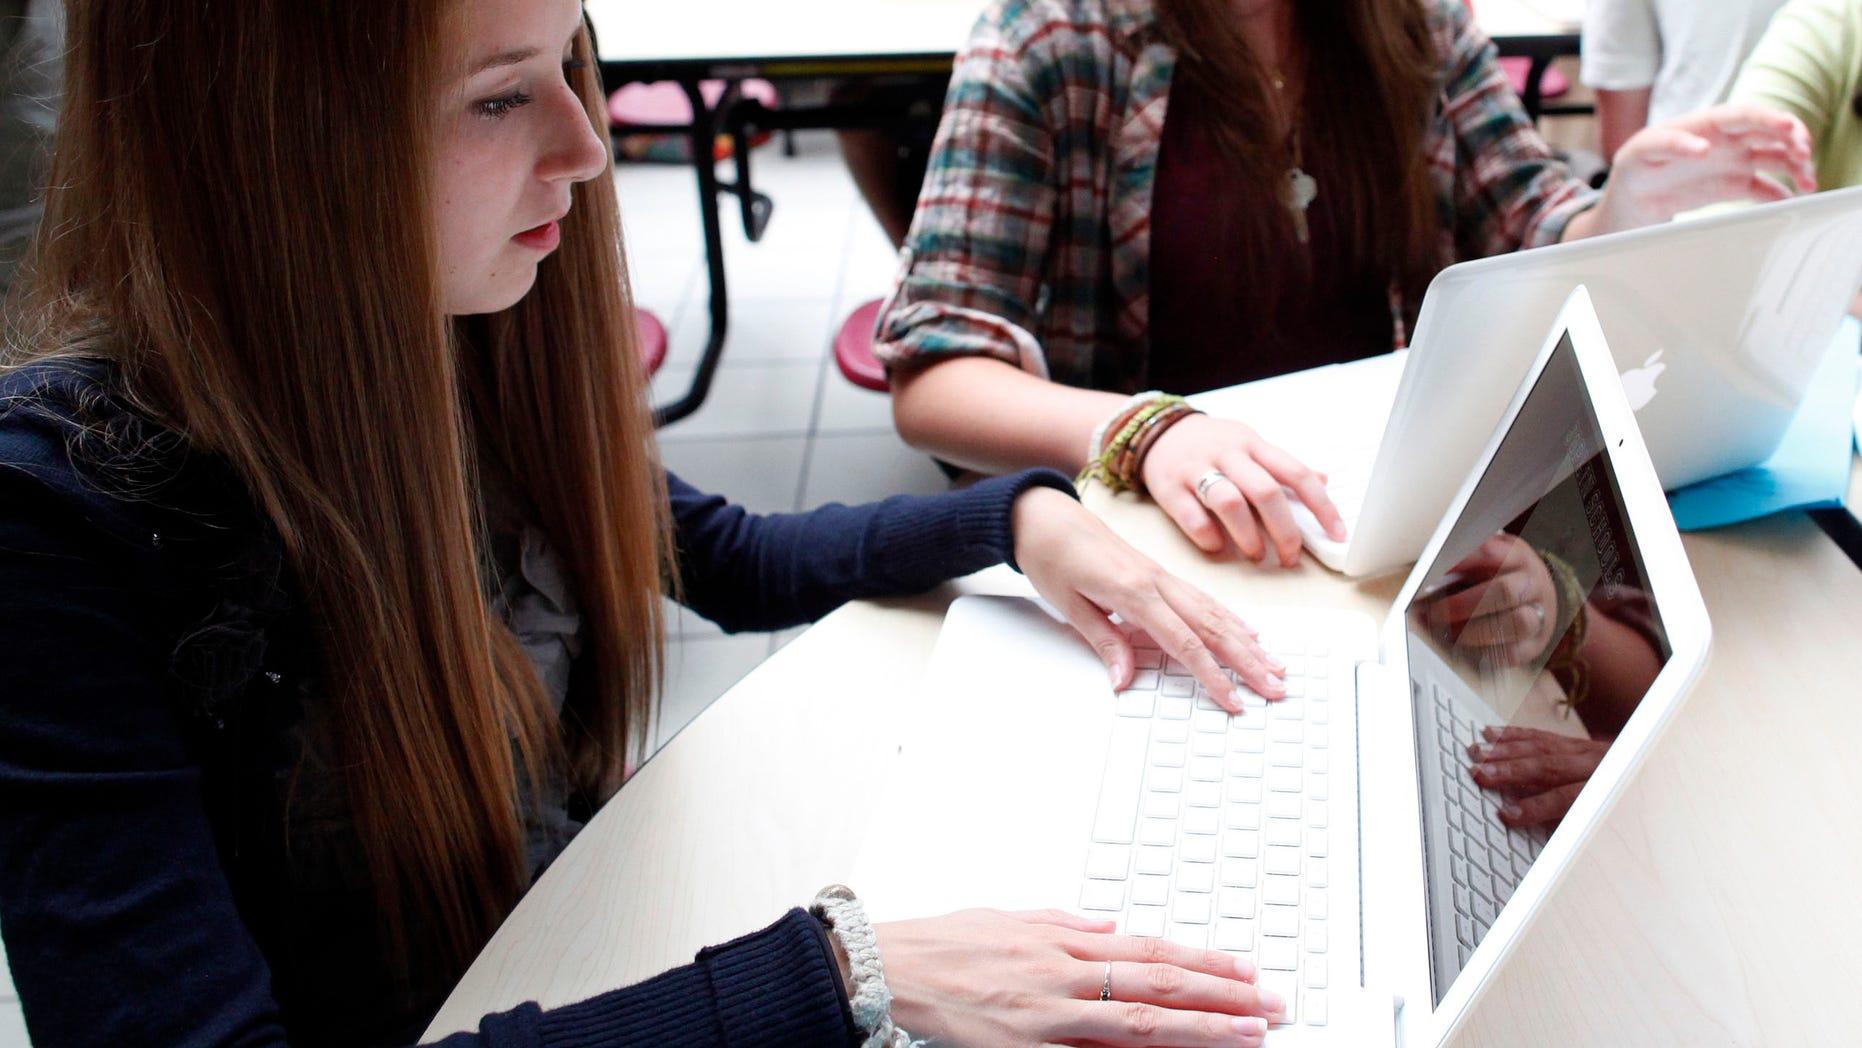 FILE: Aug. 17, 2011: Students with laptops at Joplin High School in Joplin, Missouri.